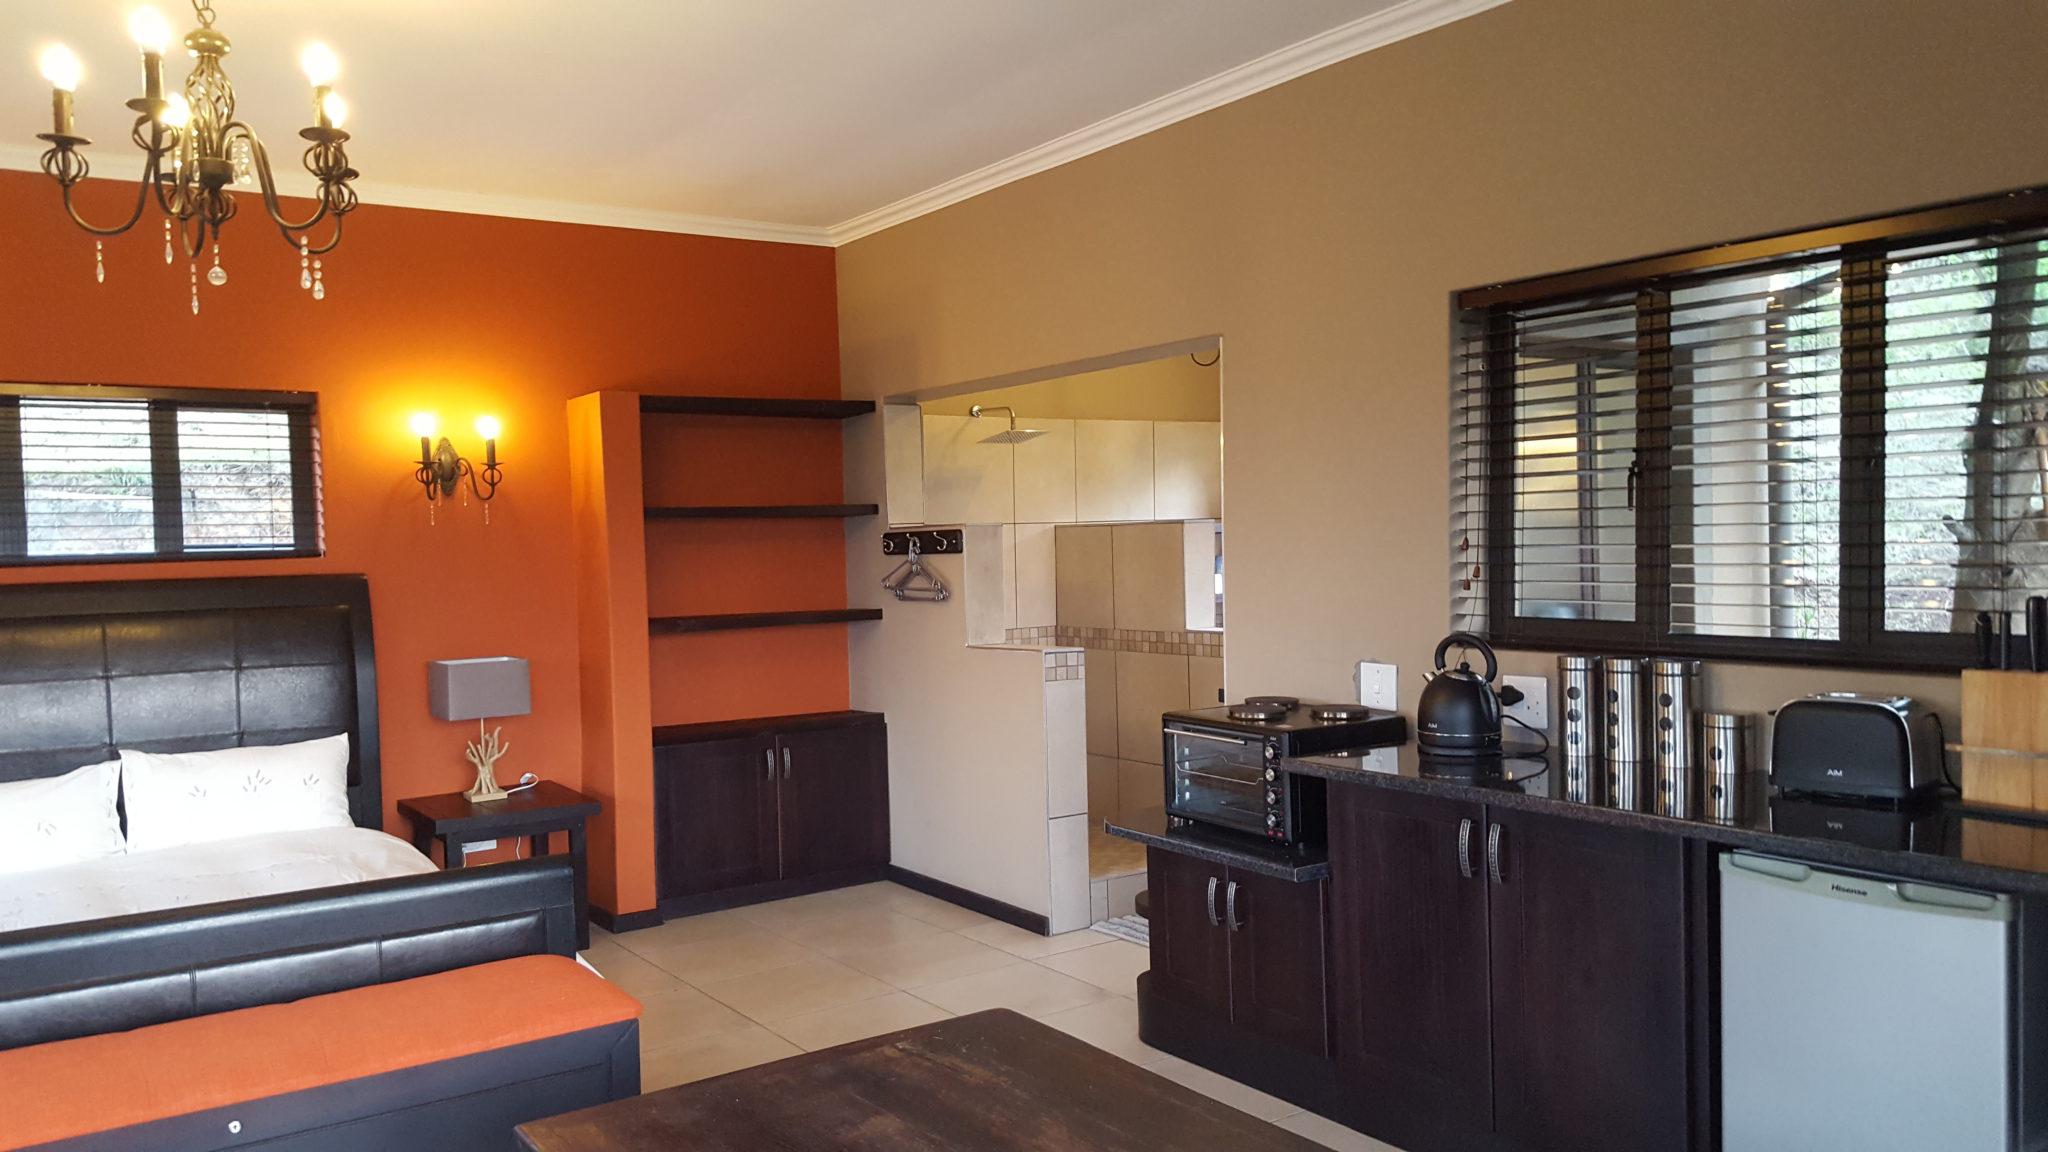 Ligwalagwala Cottage: Superior studio in Swaziland